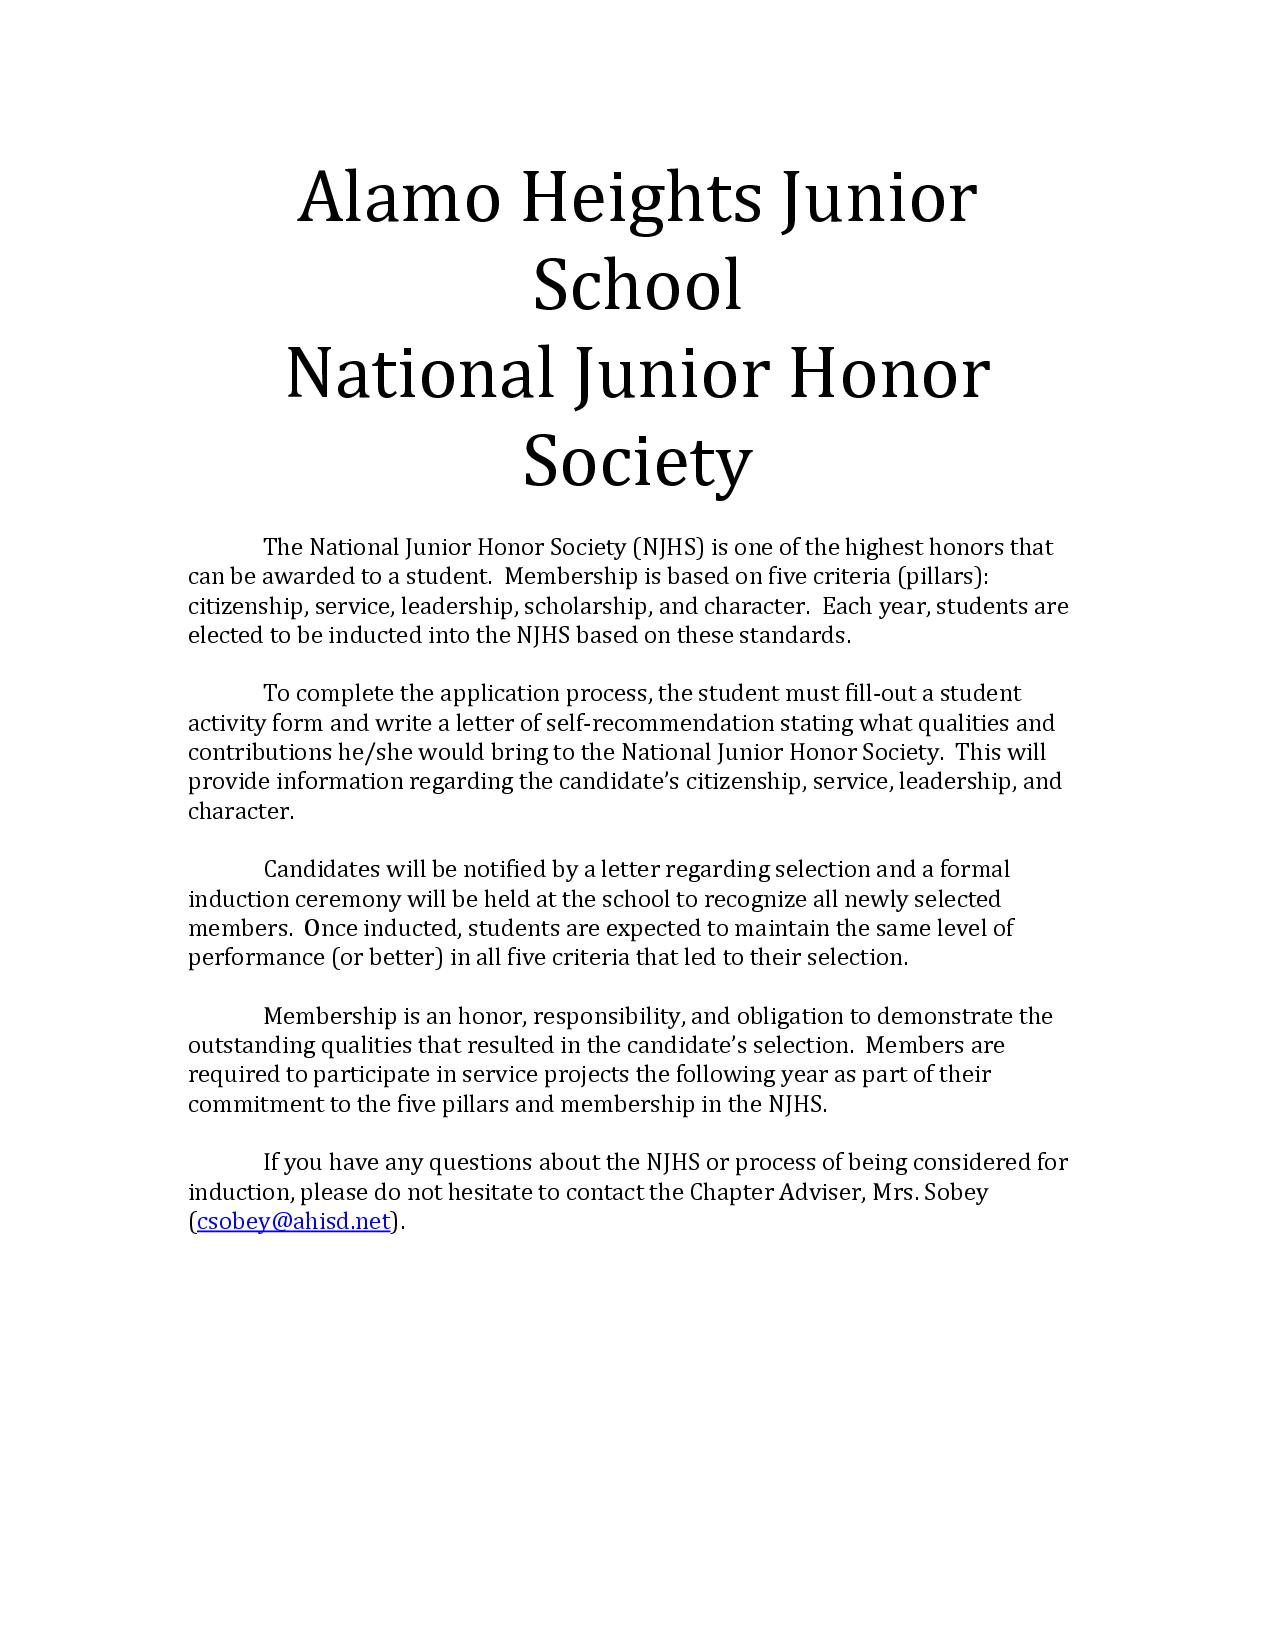 005 National Honor Society Application Essay Example Sensational Examples Service Junior Scholarship Full